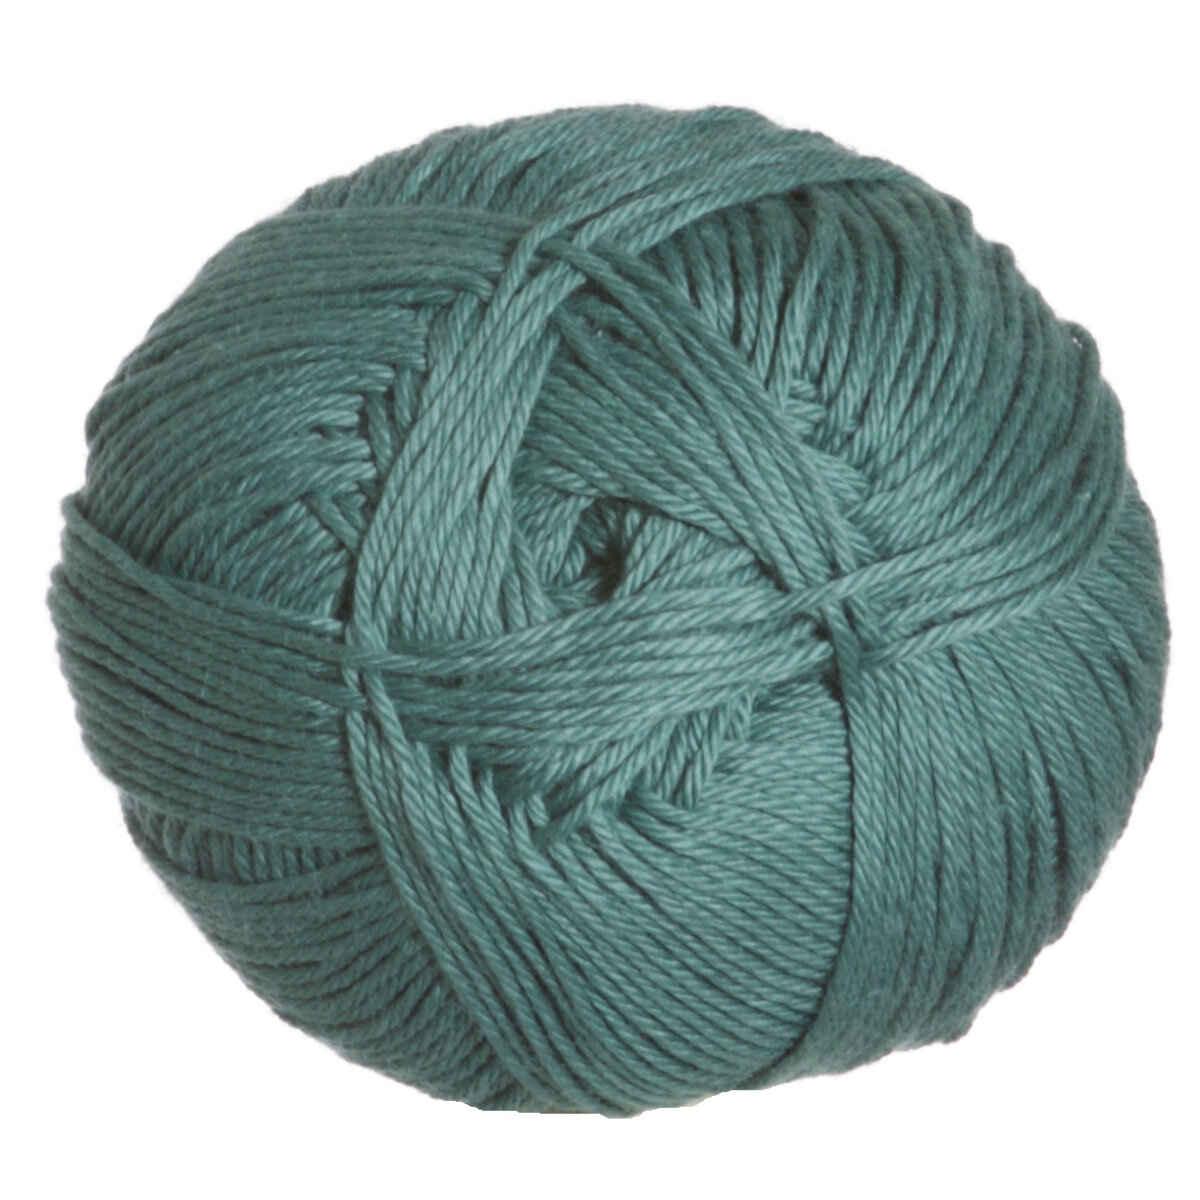 Rowan Yarn : Rowan Summerlite 4ply Yarn at Jimmy Beans Wool